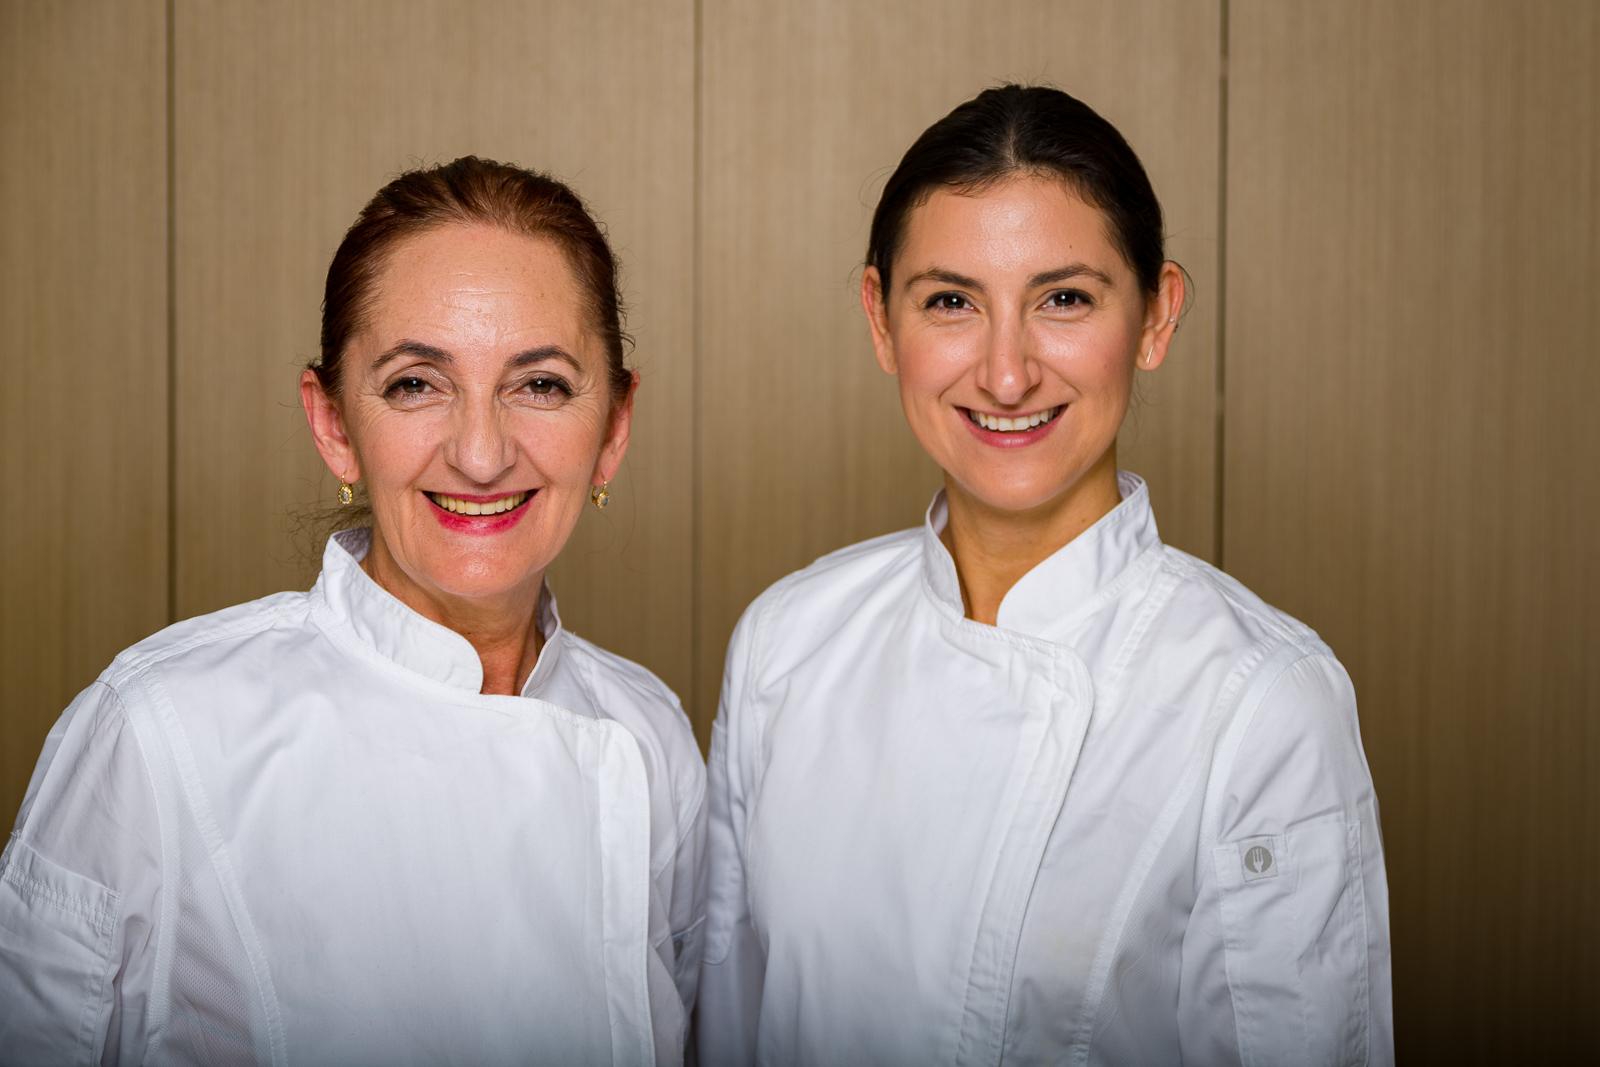 Alida Malushi (left) , Ariana Malushi (right)